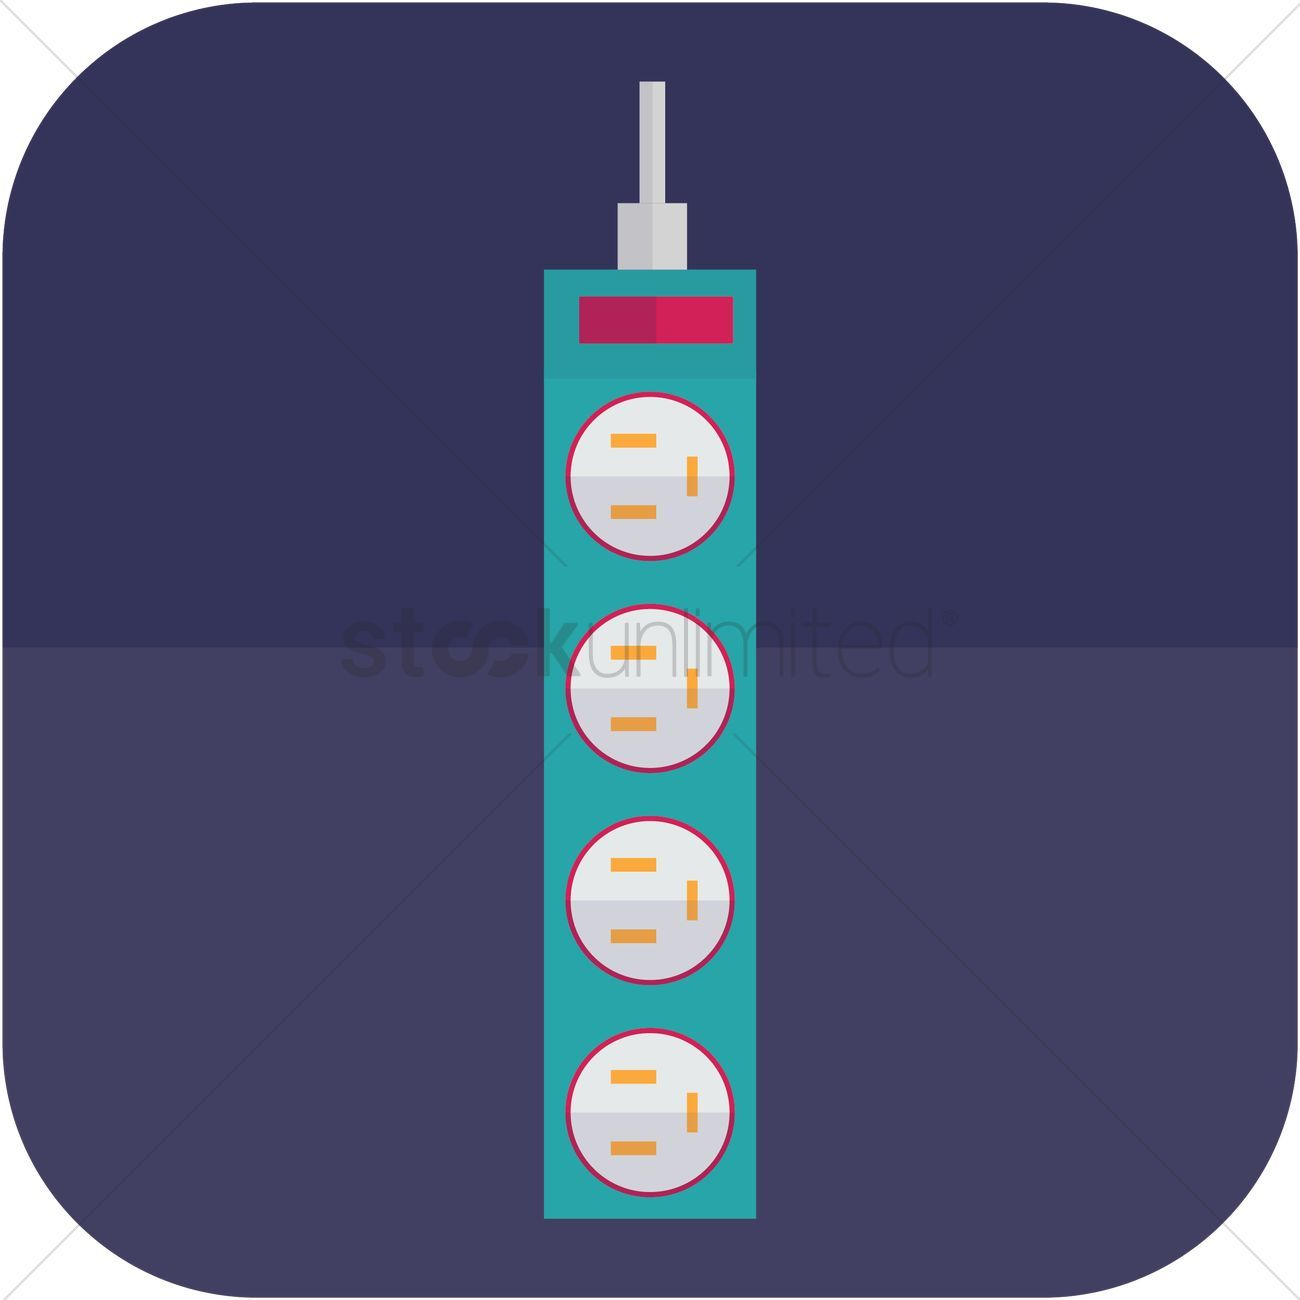 Portable outlet electrical socket vector illustration , #ad, #electrical, #outlet, #Portable, #illustration, #vector #affiliate